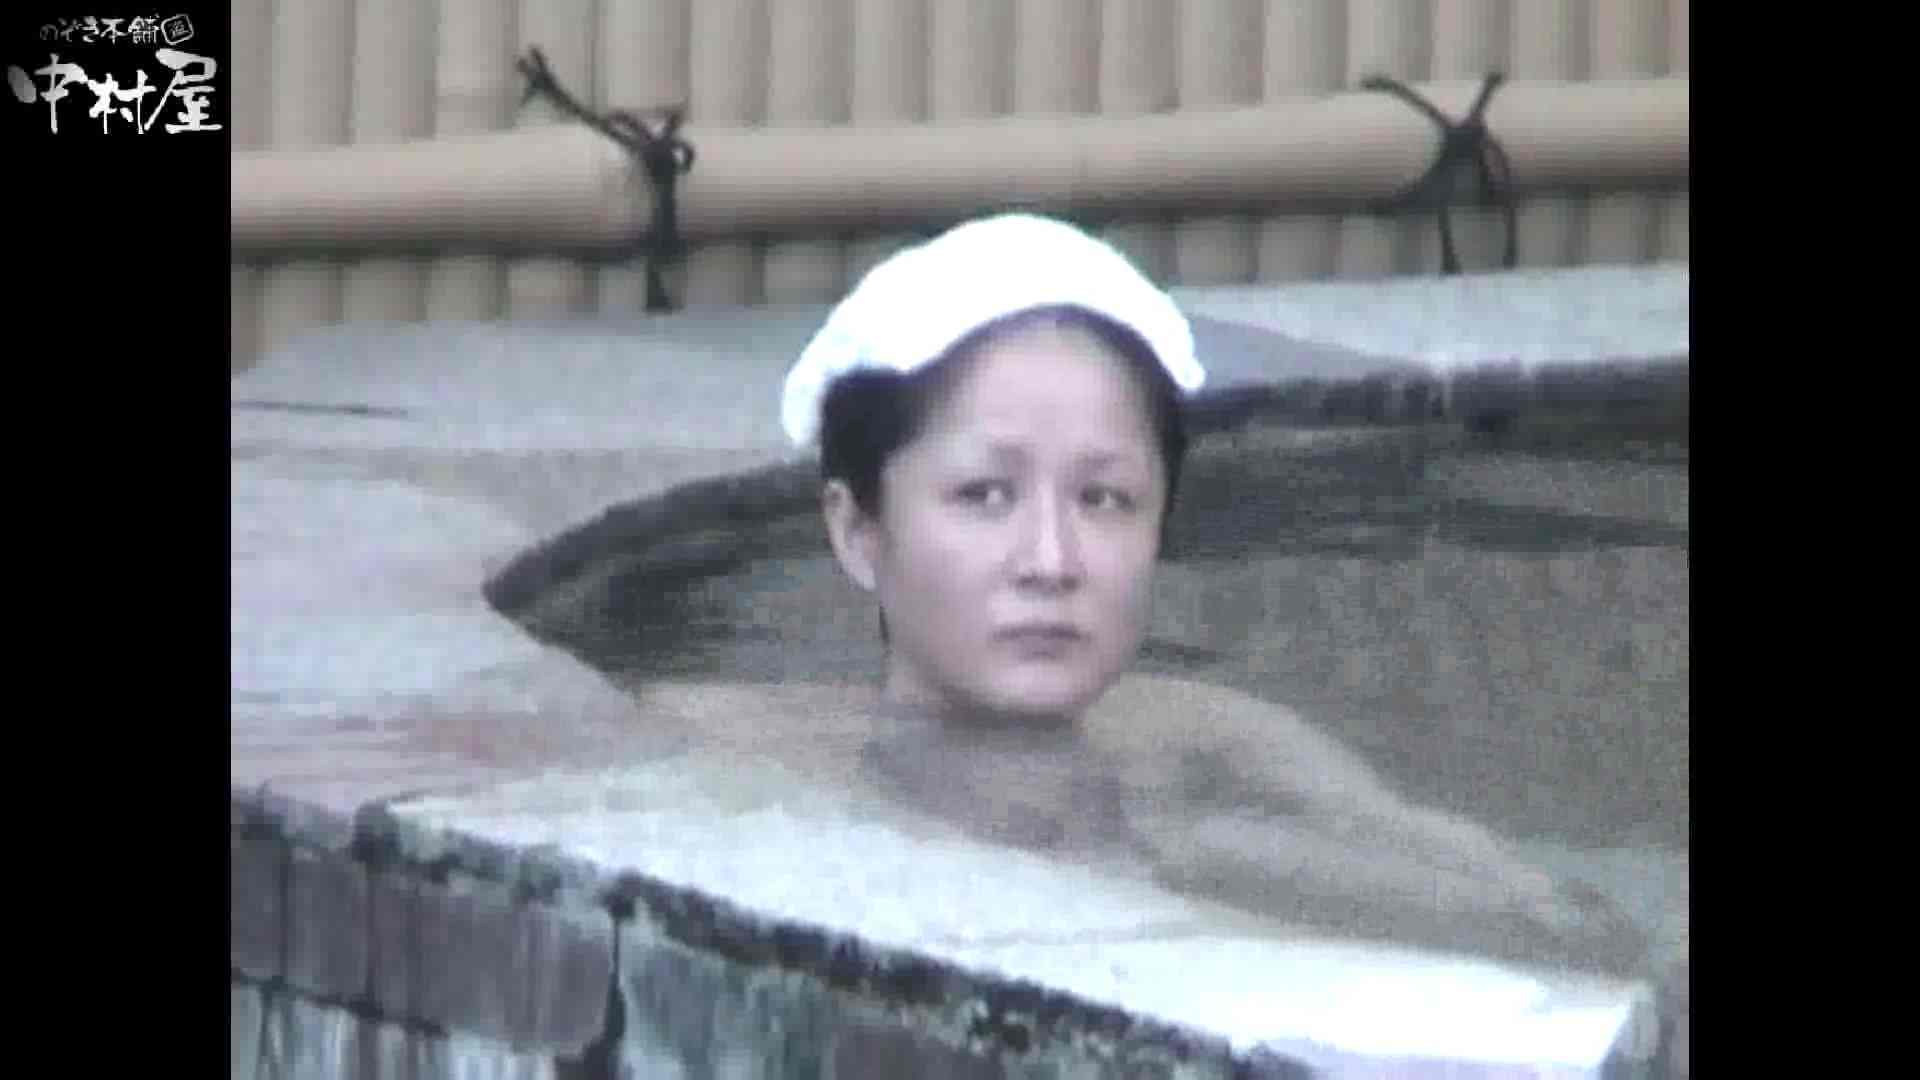 Aquaな露天風呂Vol.880潜入盗撮露天風呂十六判湯 其の六 露天 | 潜入シリーズ  95pic 83